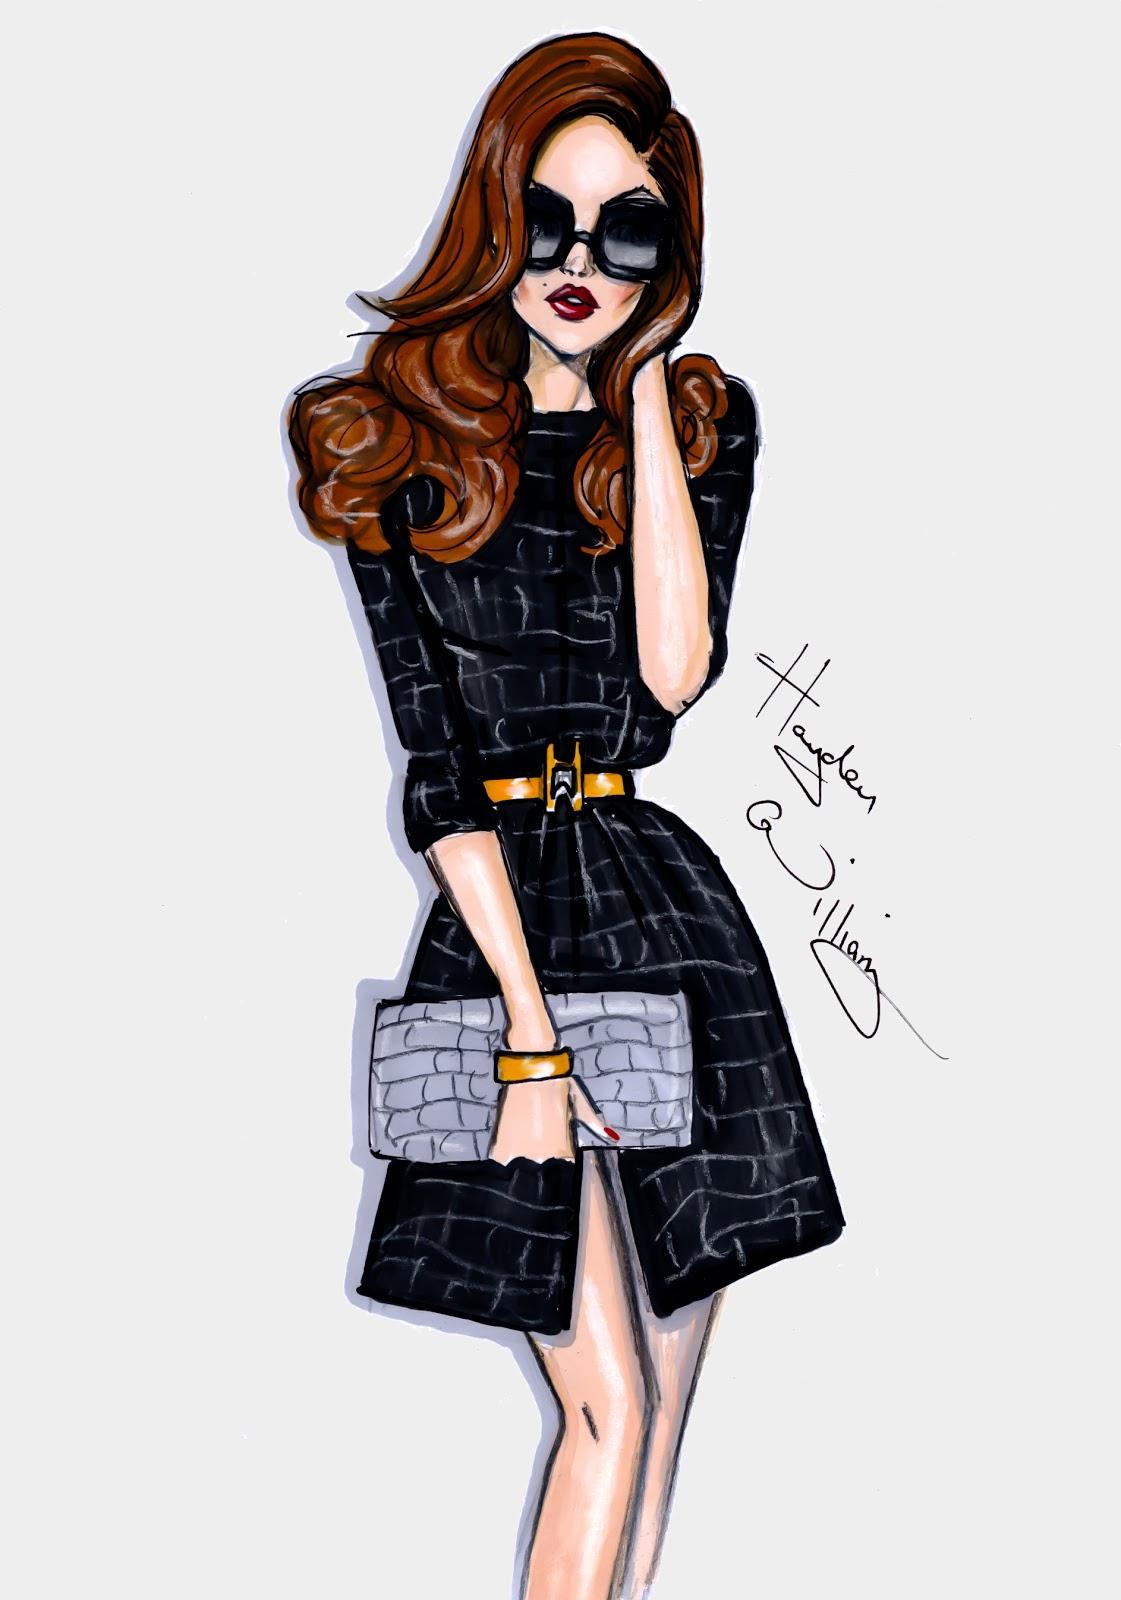 Fashion Illustration Royalty Free Stock Photo: Hayden Williams Fashion Illustrations: 'Black Magick' By